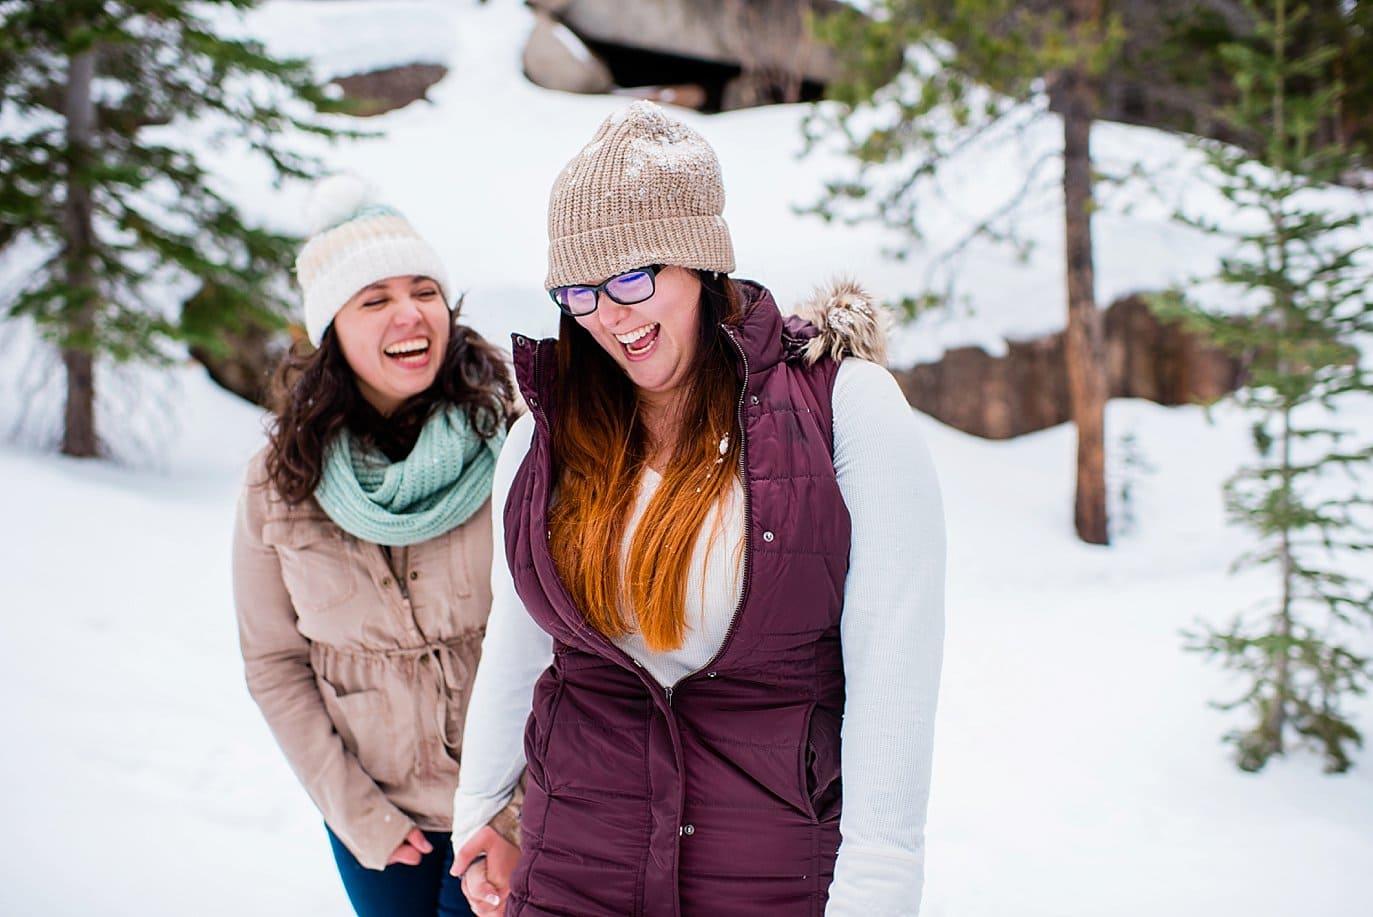 lesbian winter engagement at Alberta Falls Rocky Mountain National Park winter hiking engagement by Estes Park engagement photographer Jennie Crate, Photographer